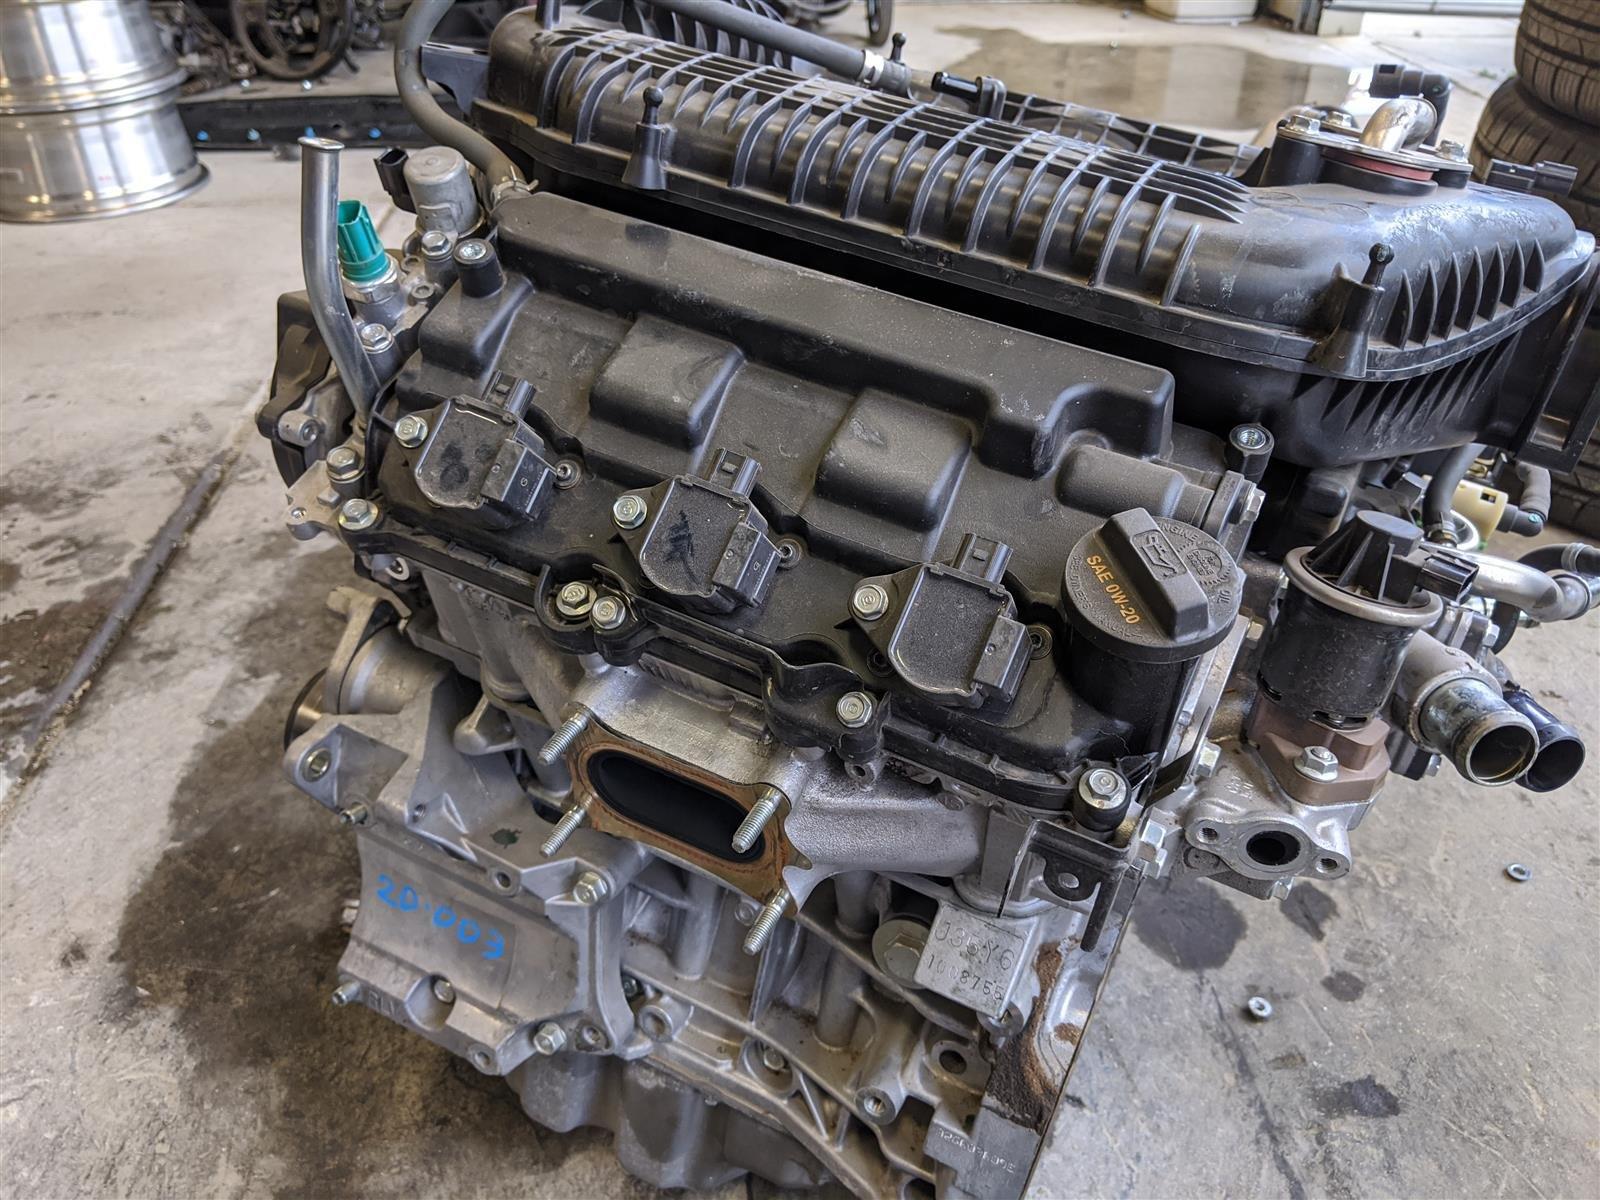 2016 Honda Pilot 6 Speed 2wd Engine Longblock Replacement